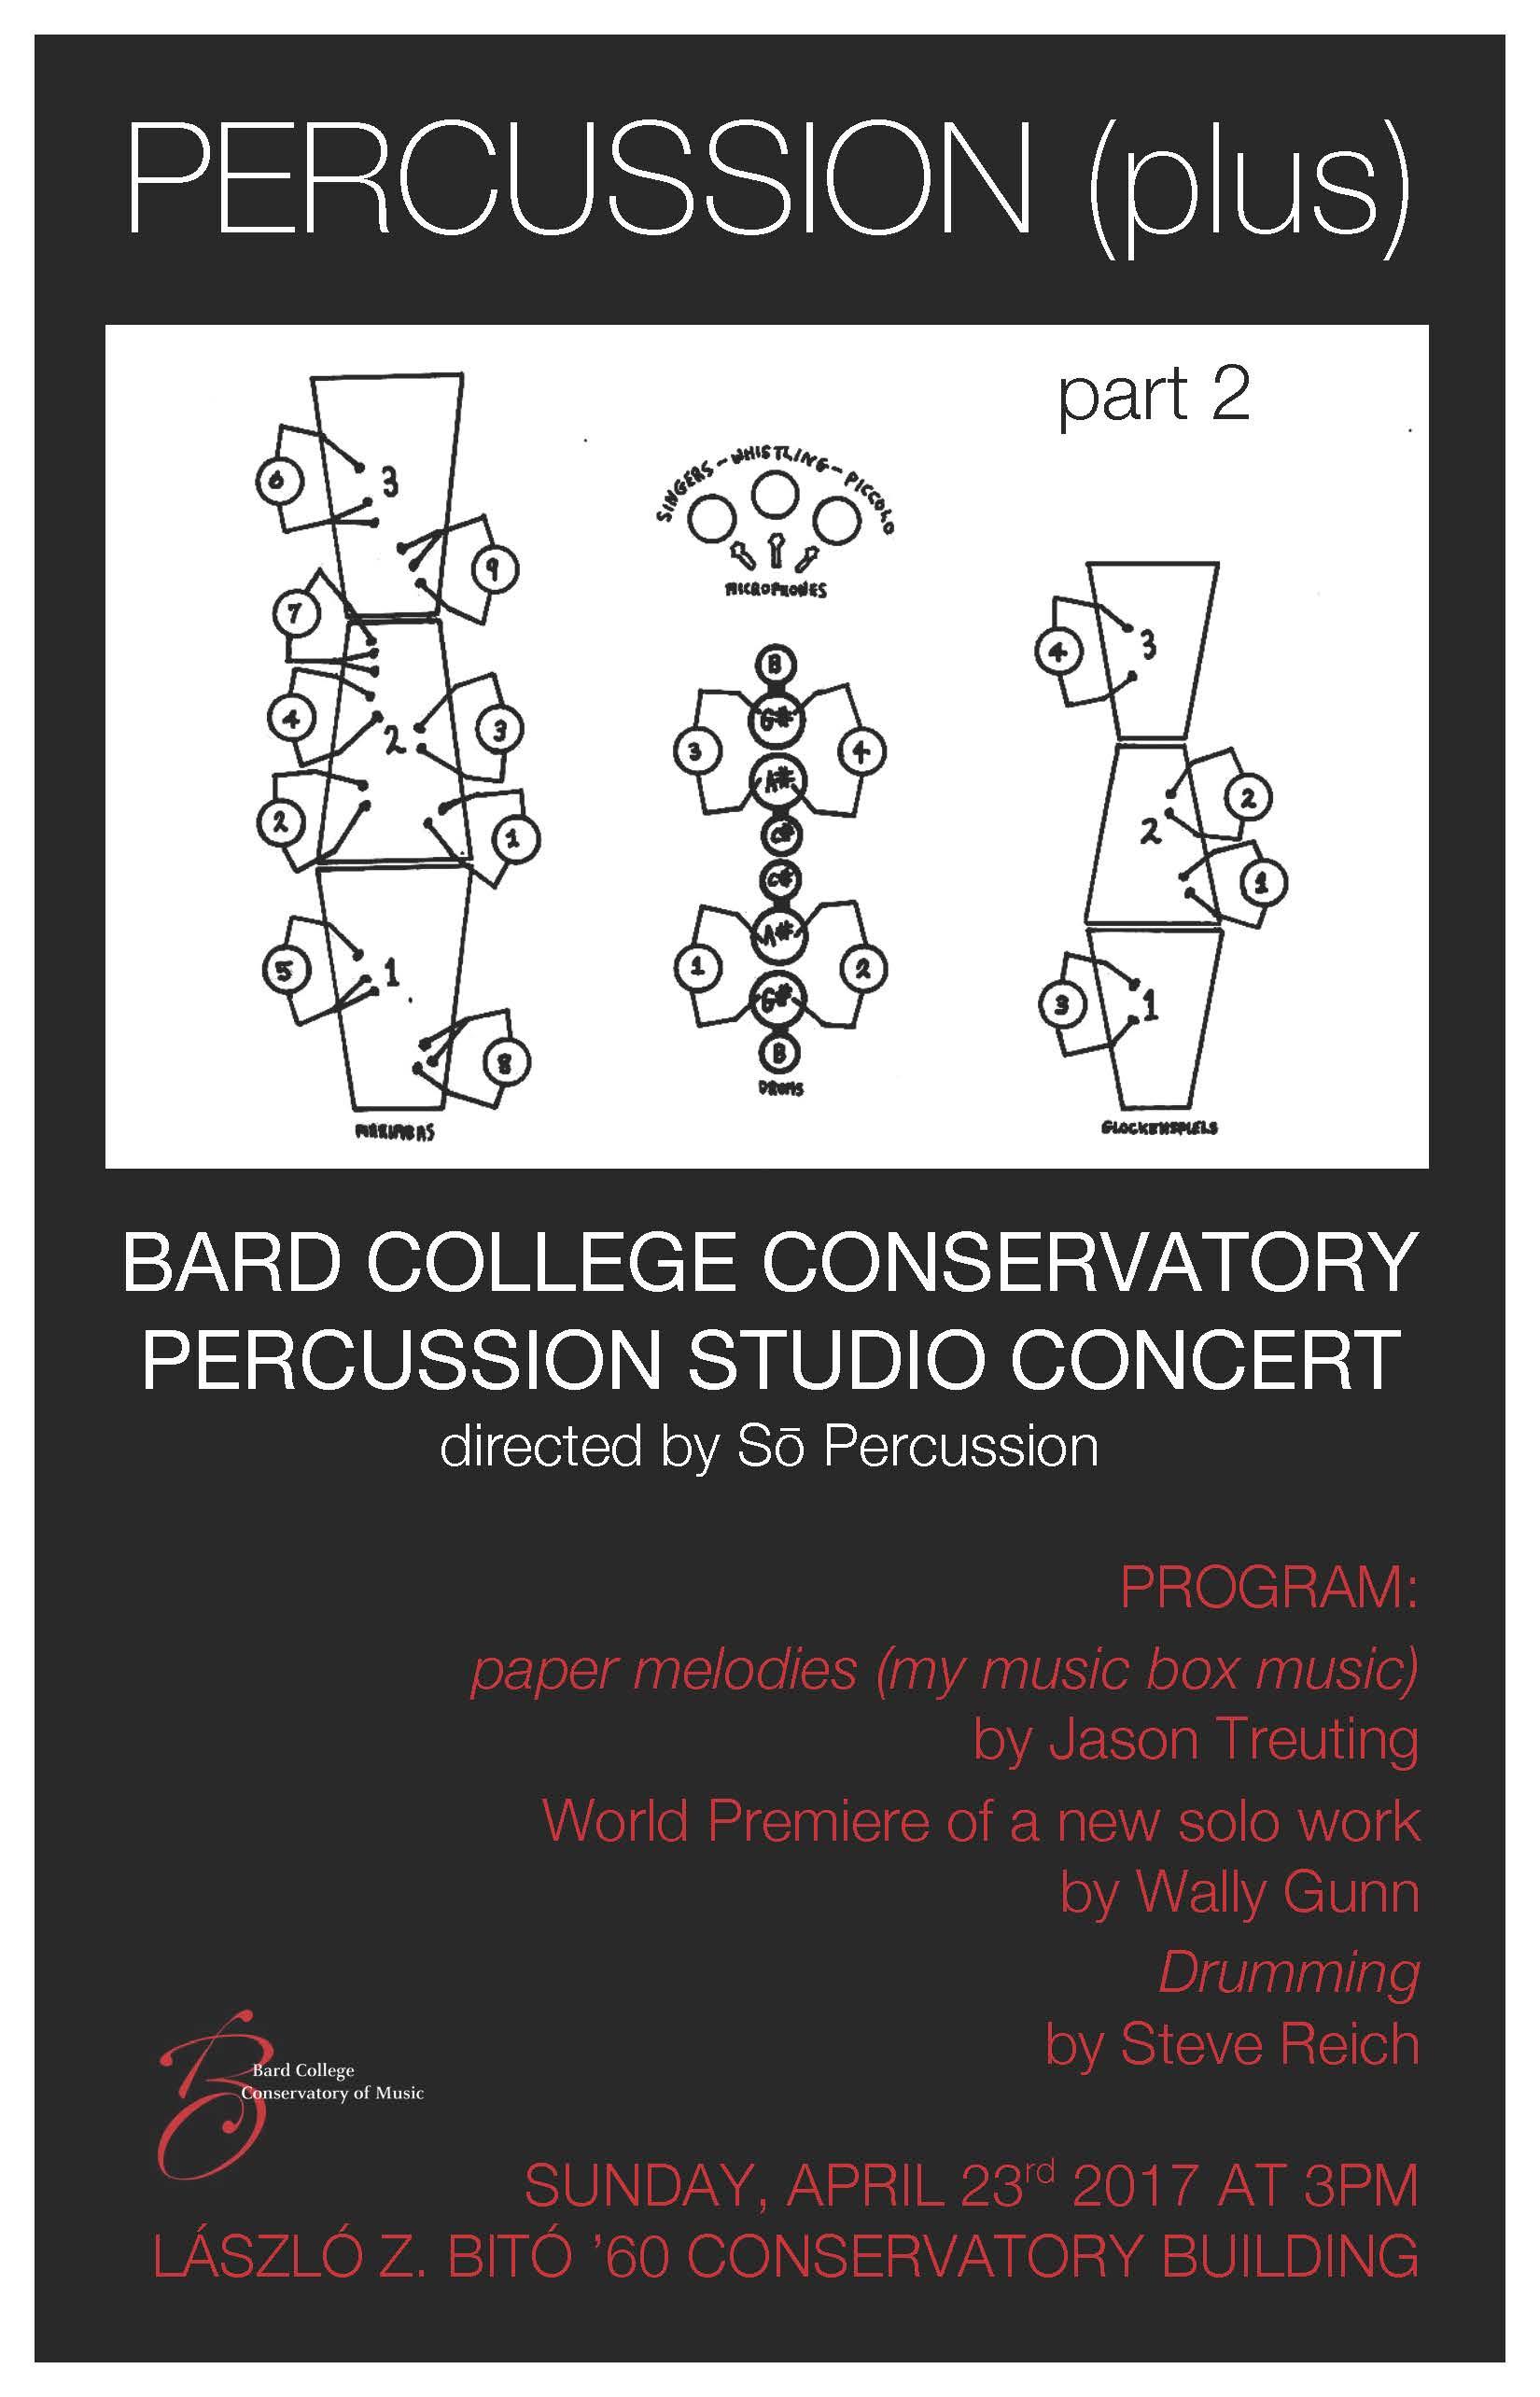 [Conservatory Percussion Studio Concert]